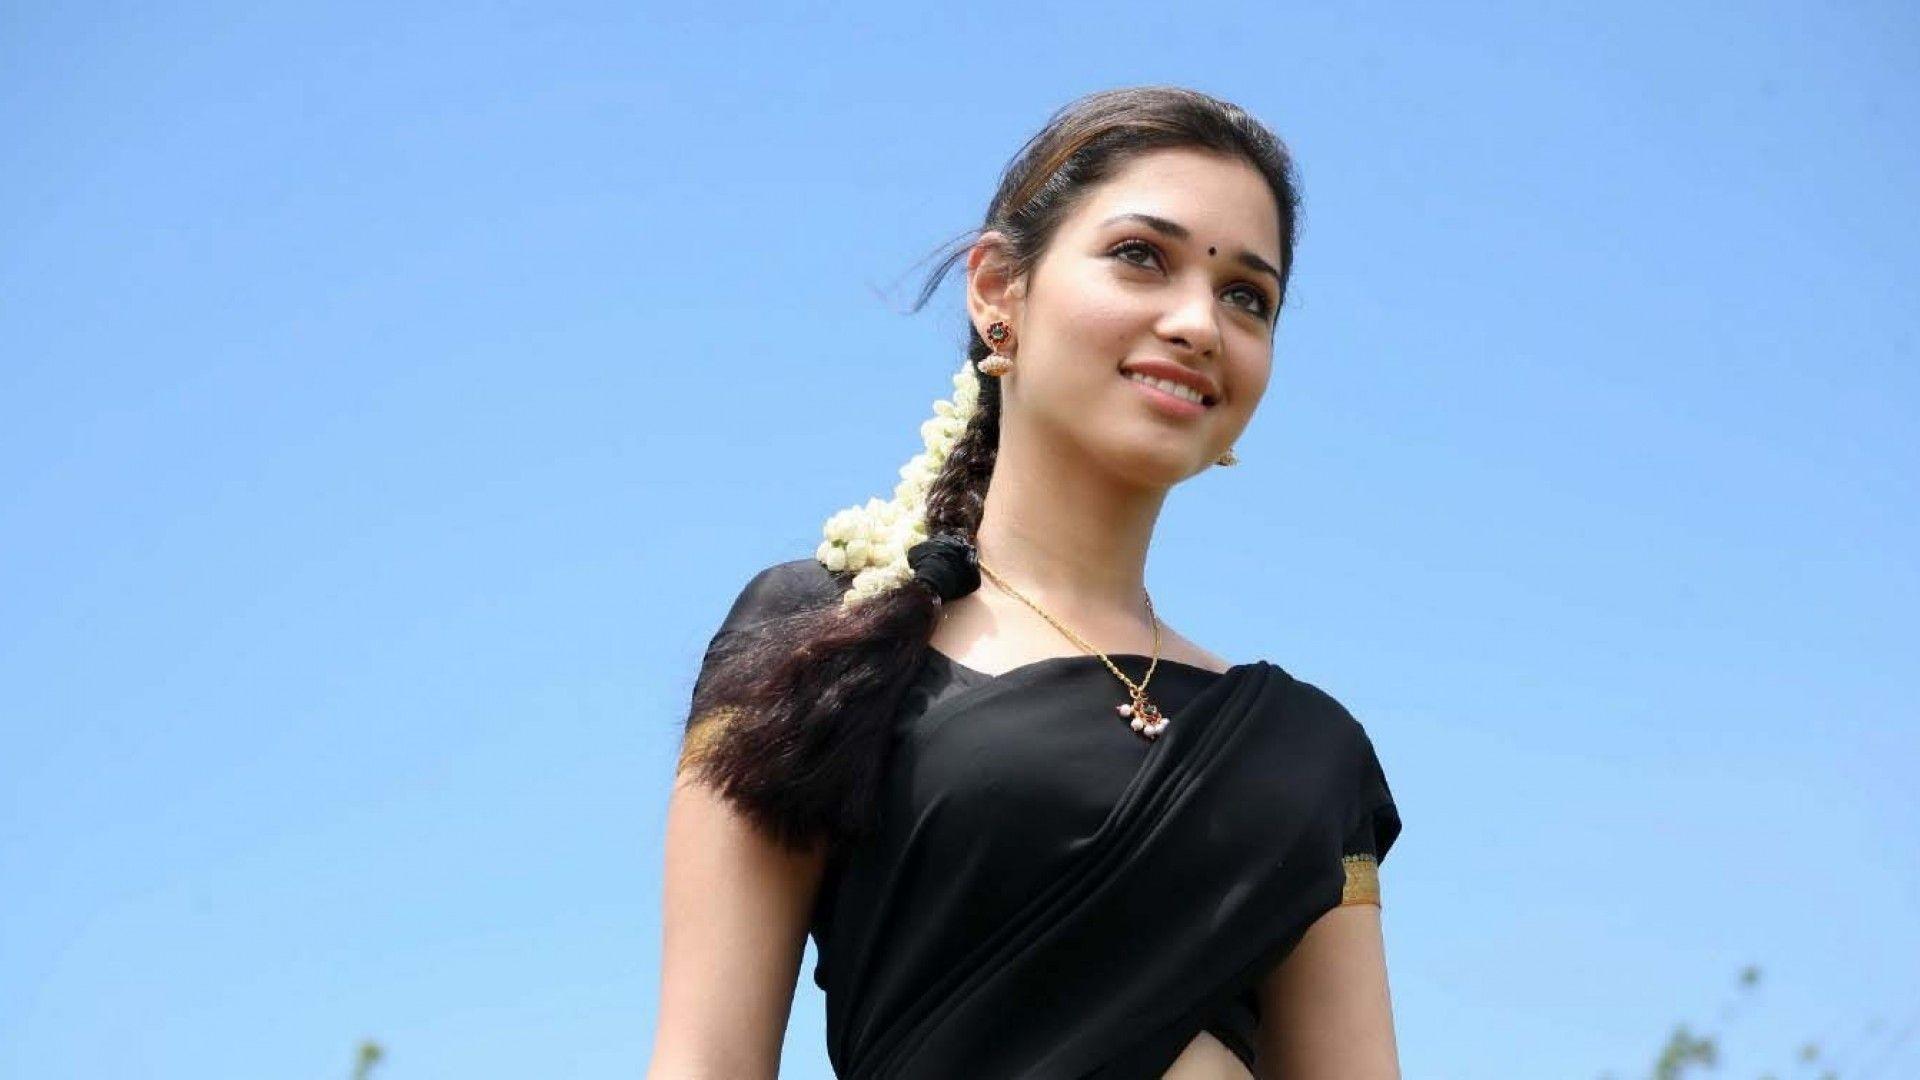 Indian Celebrities Tamanna Bhatia Wallpaper Wallpapers - Indian Beautiful Girl Face , HD Wallpaper & Backgrounds